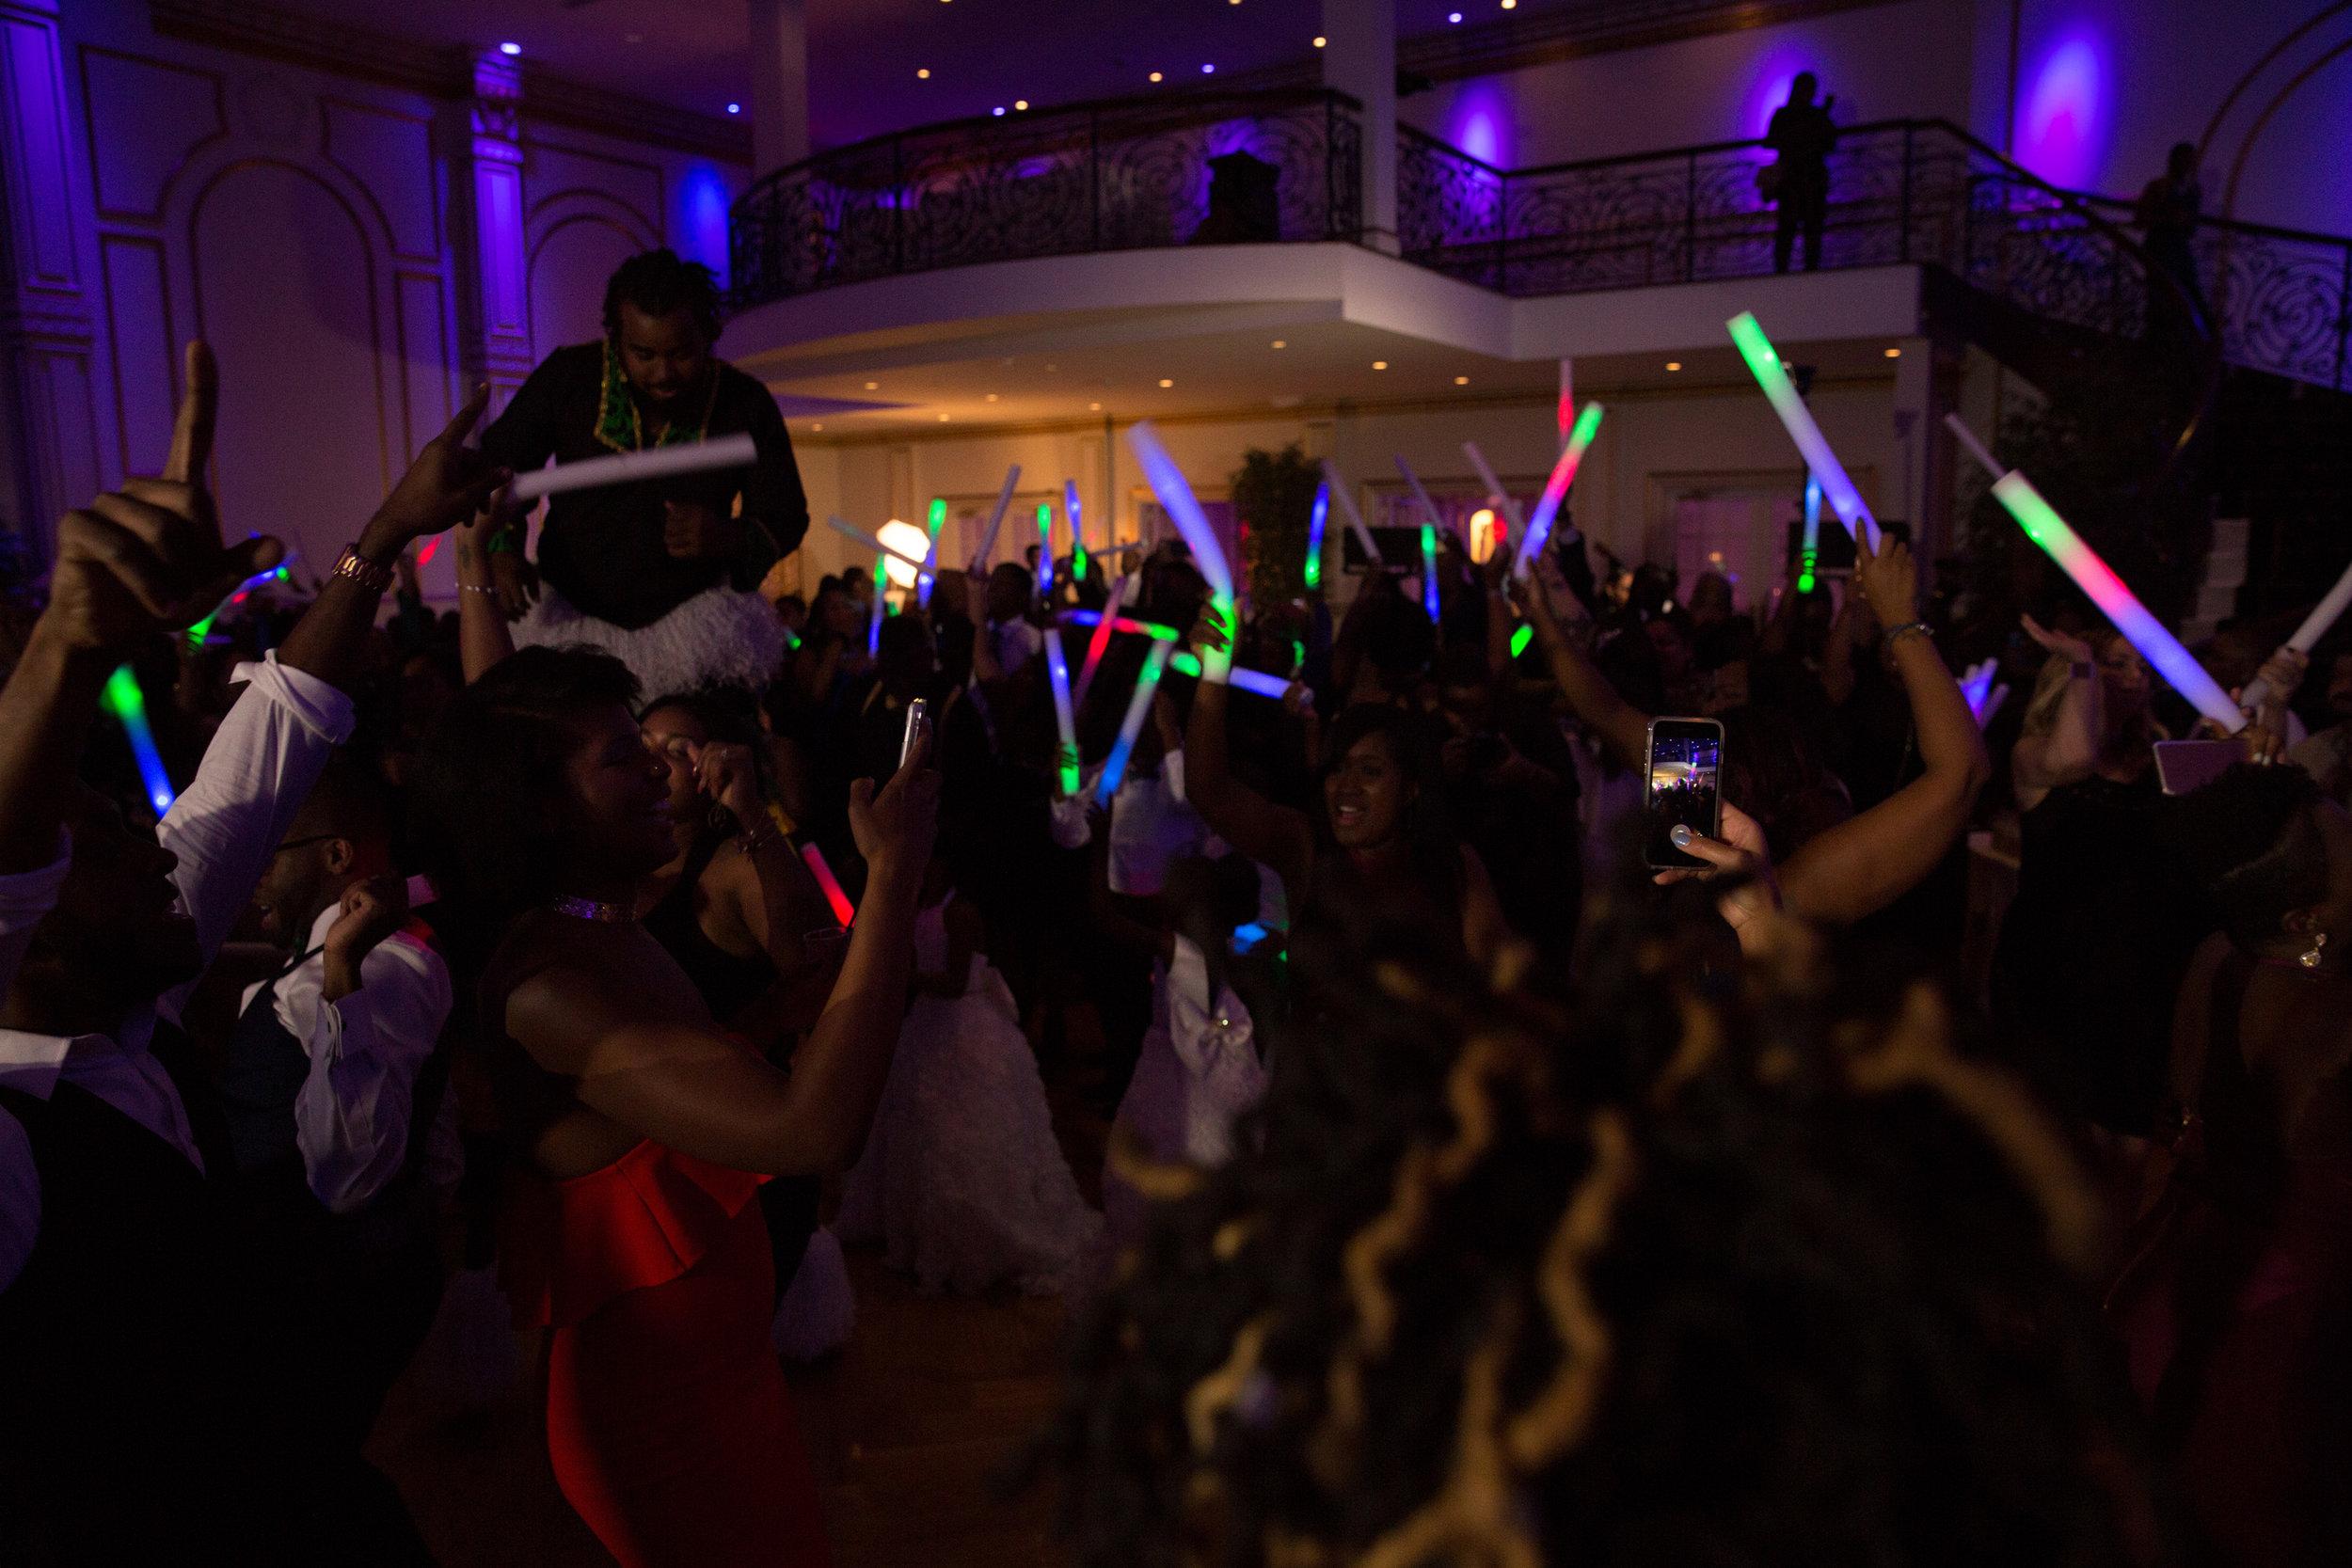 victorious-events-nyc-034-romie-kamali-tides-estate-wedding-nana-annan.jpg